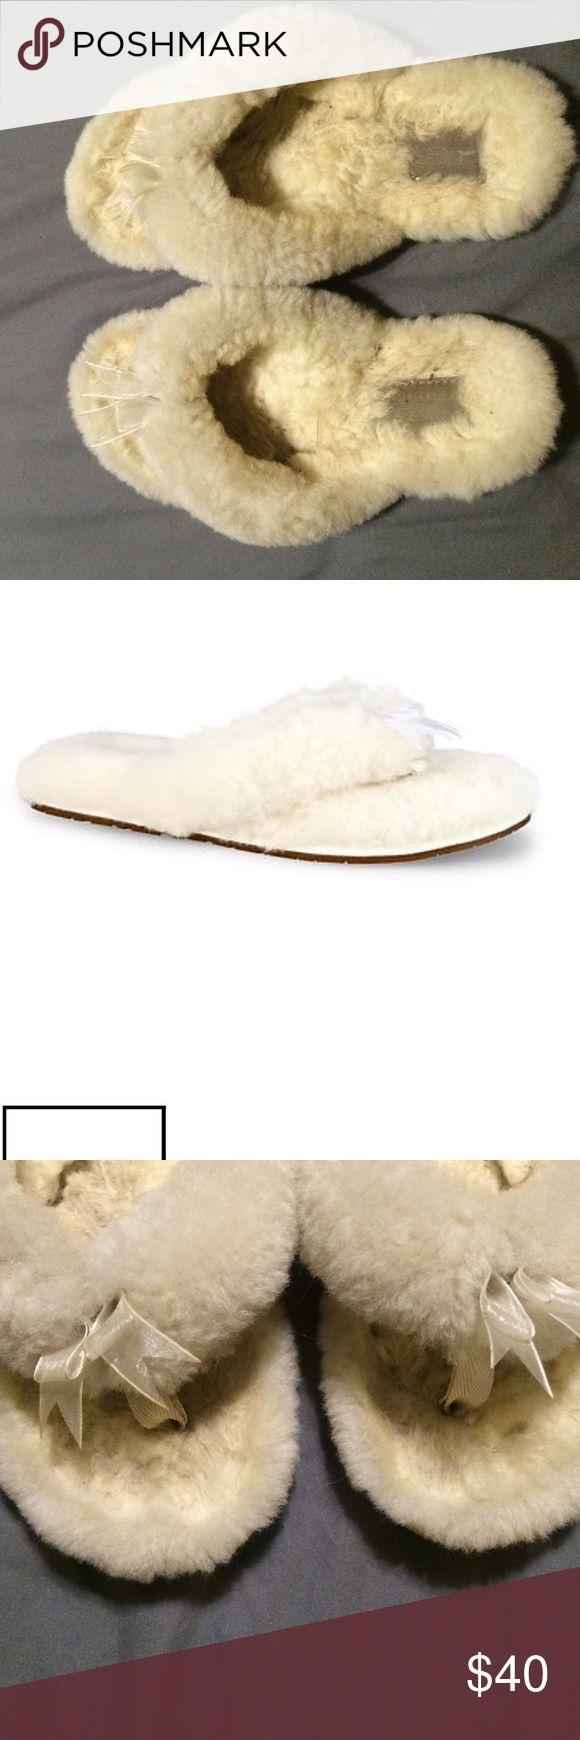 Ugg slipper flip flops Gently used ugg womens cream flip flop slippers UGG Shoes Slippers